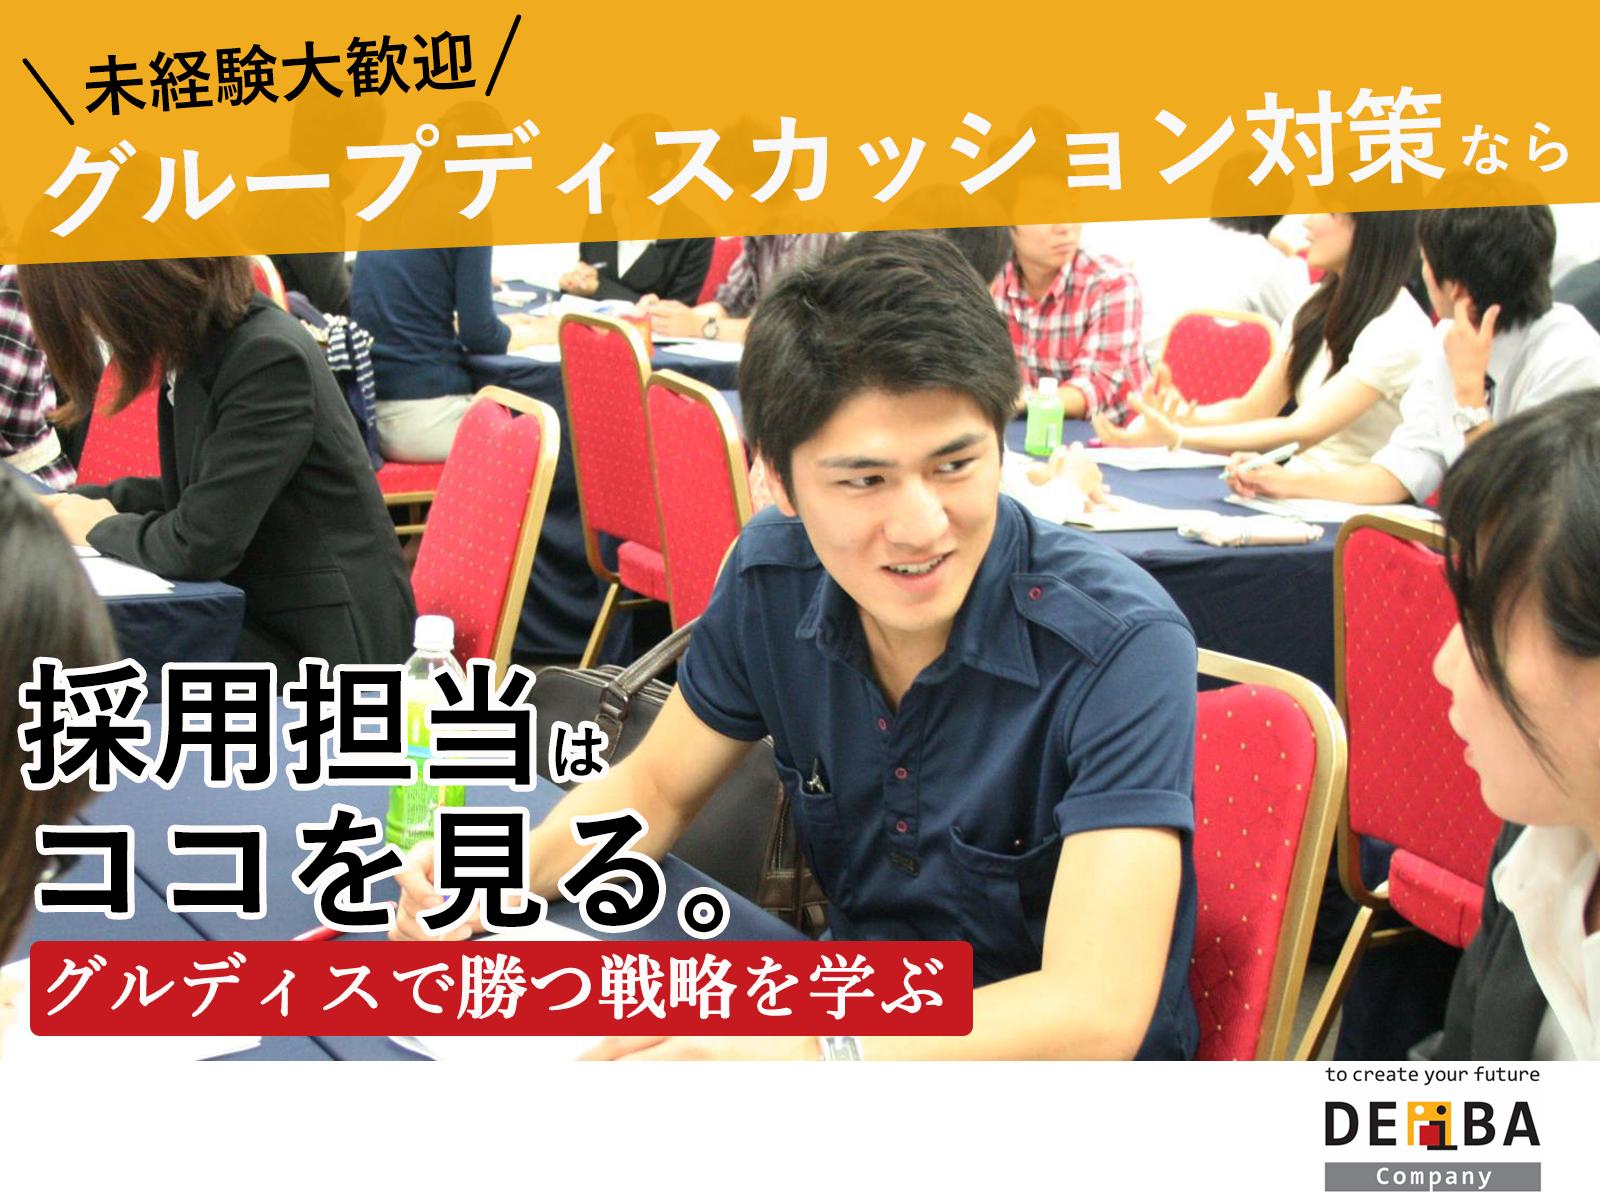 【DEiBA company】グループディスカッションで通過する人の特徴は?